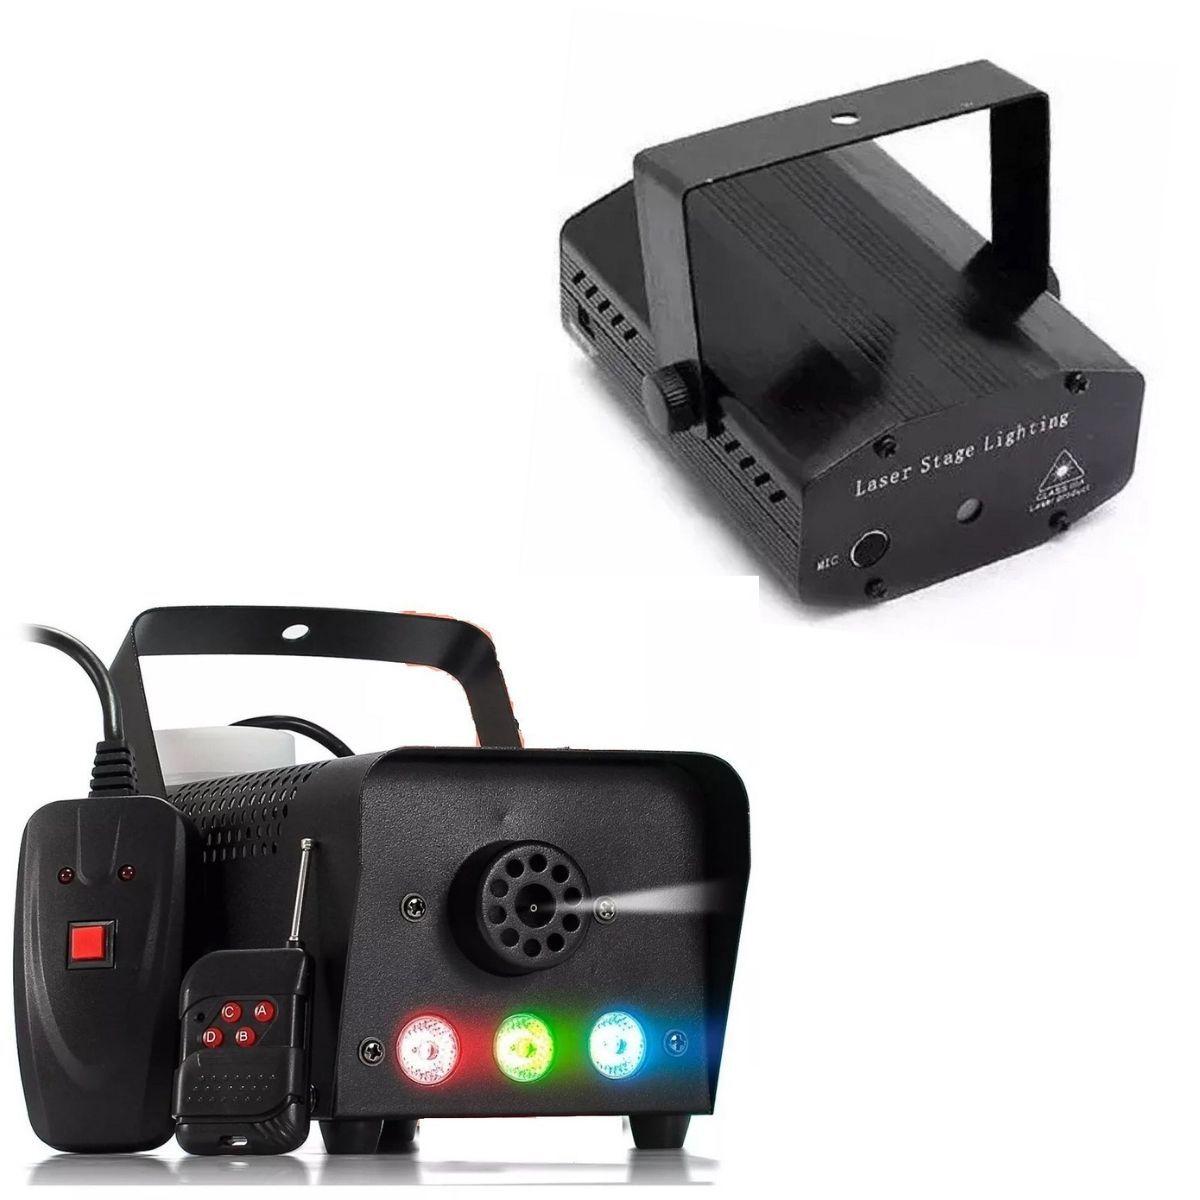 Kit Festa Com 2 Mini Laser Profissional Led Com 2 Maquina De Fumaça 600W Controle Sem Fio 600